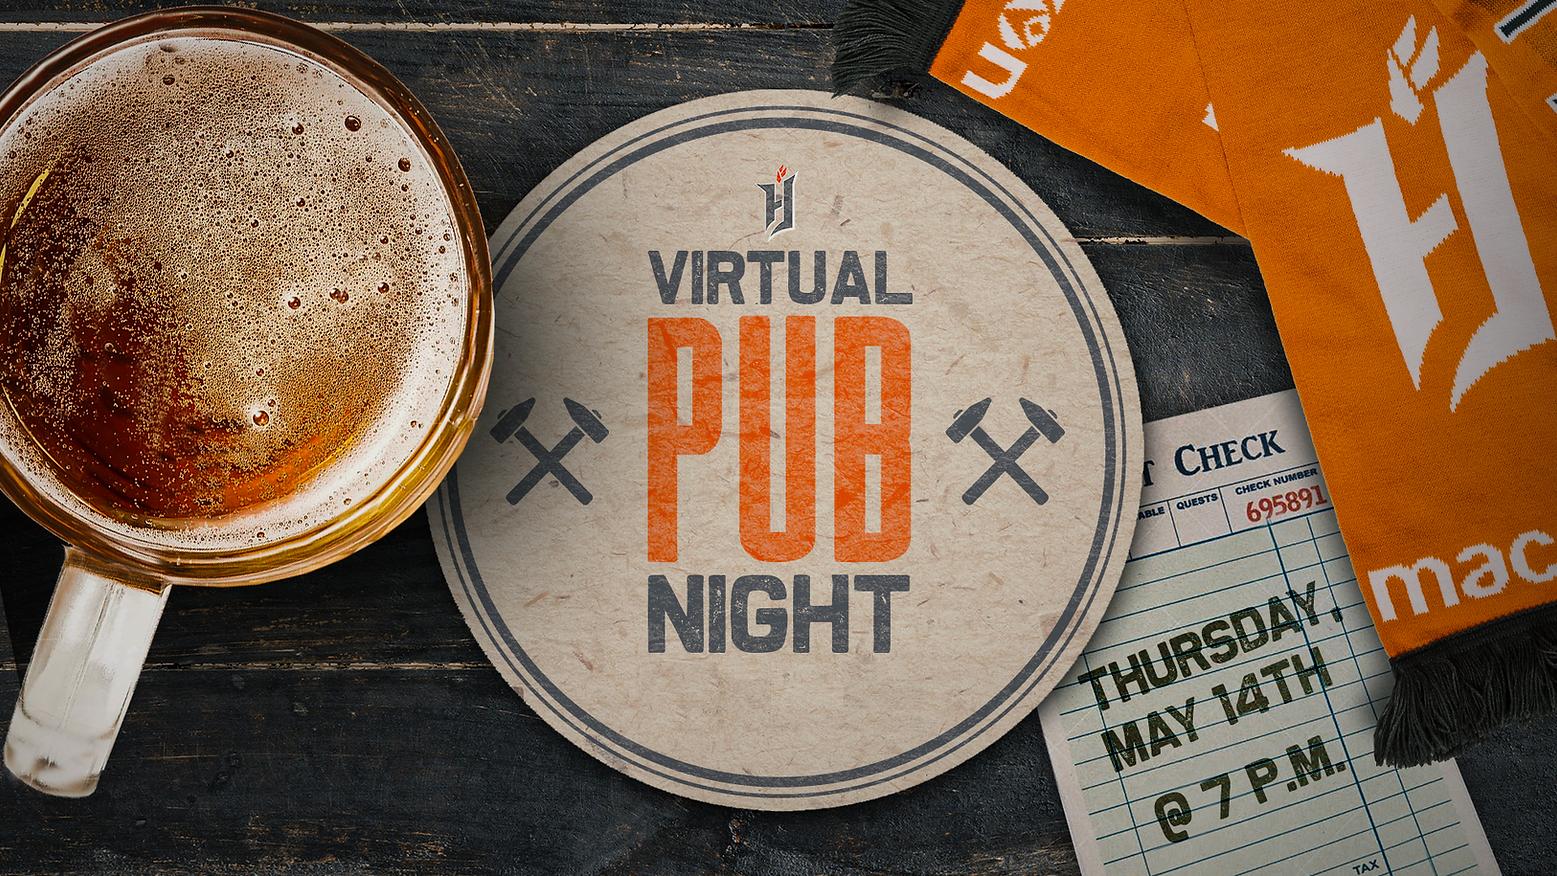 Pub-Night-Graphic-16x9.png